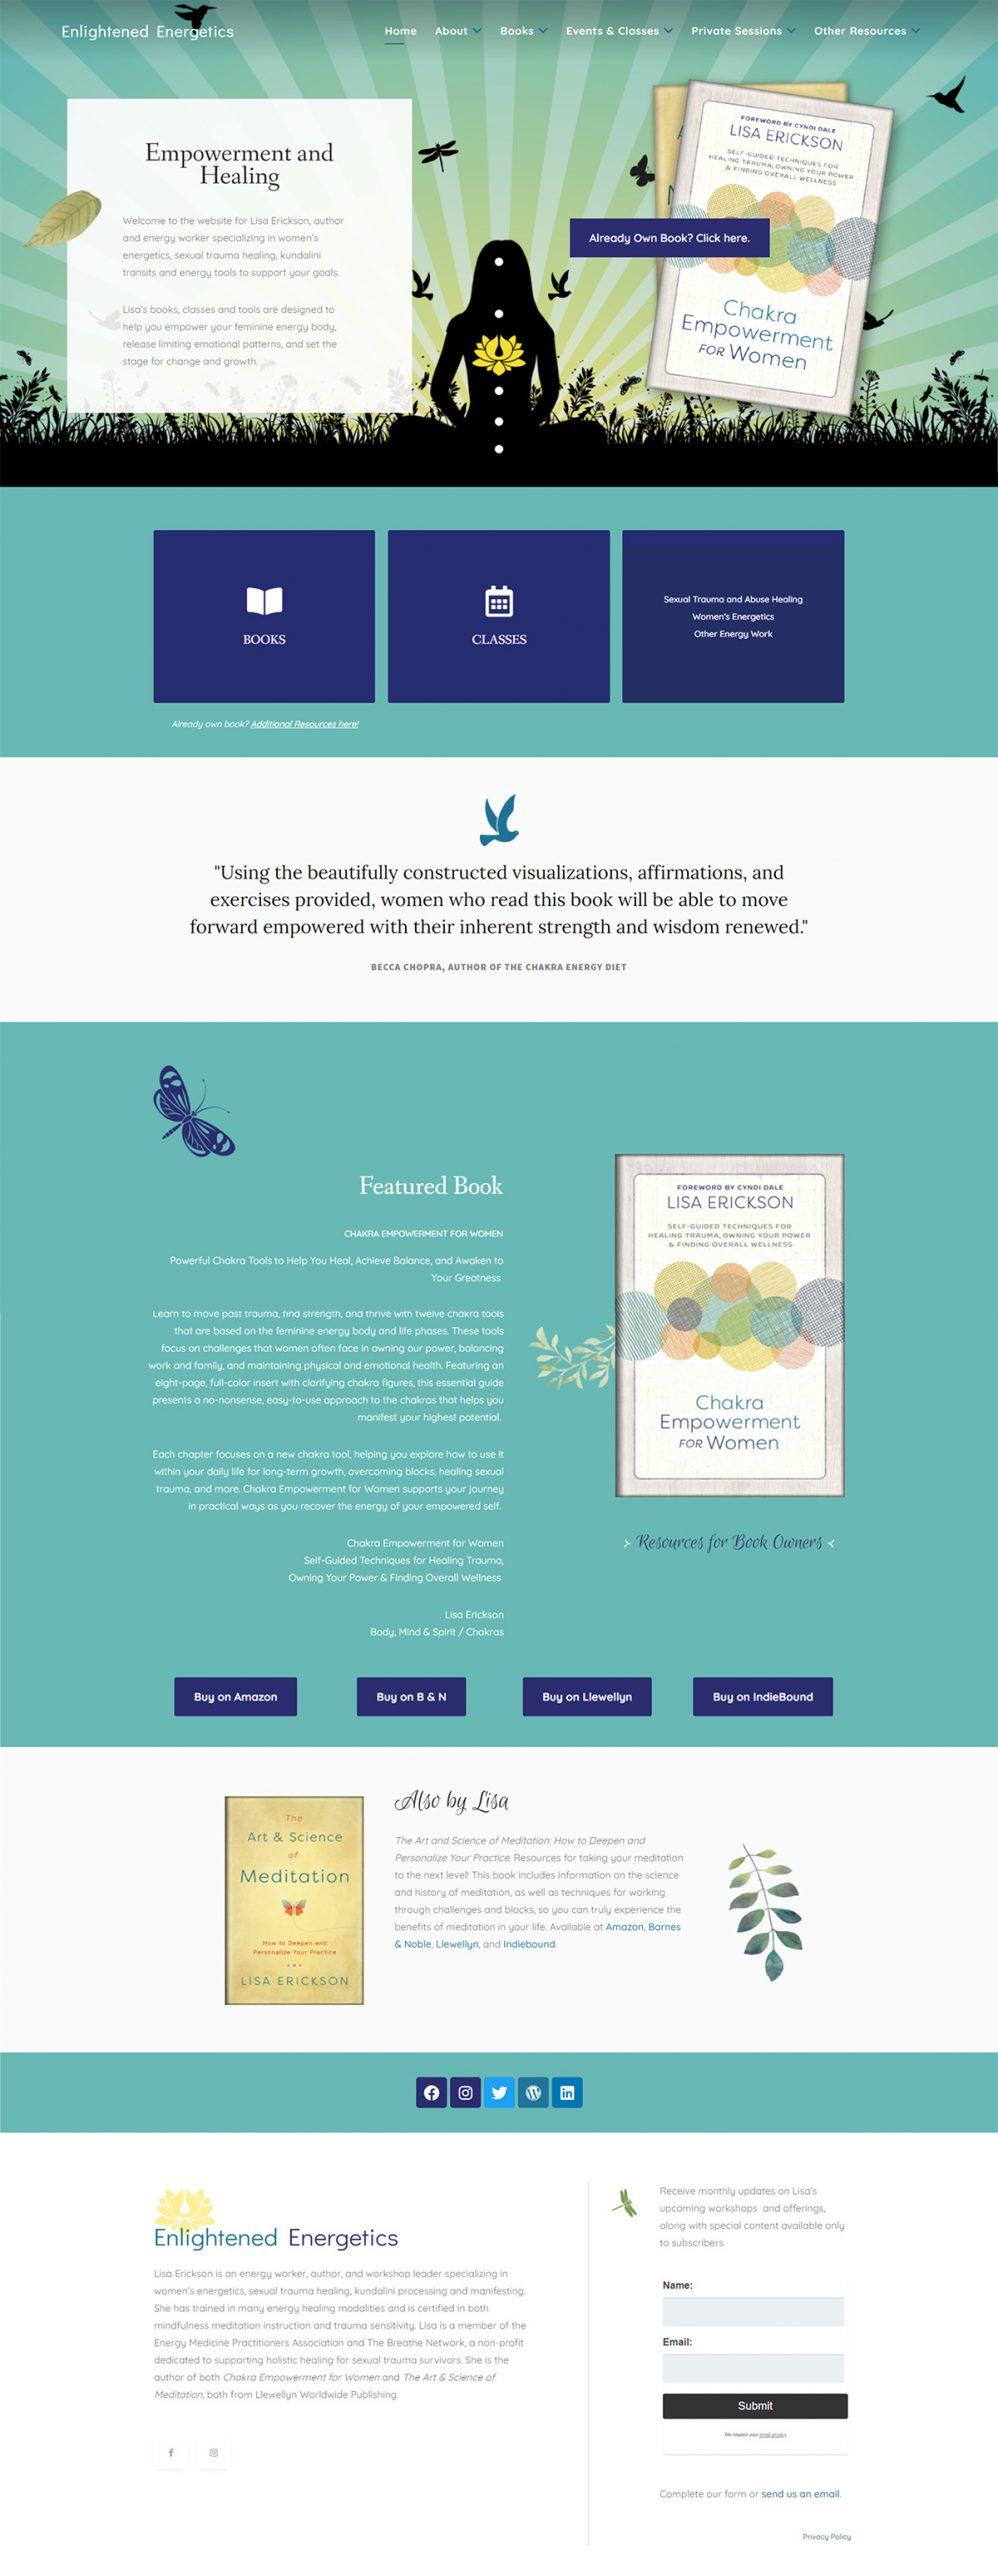 Enlightened Energetics and Chakra Empowerment for Women website redesign